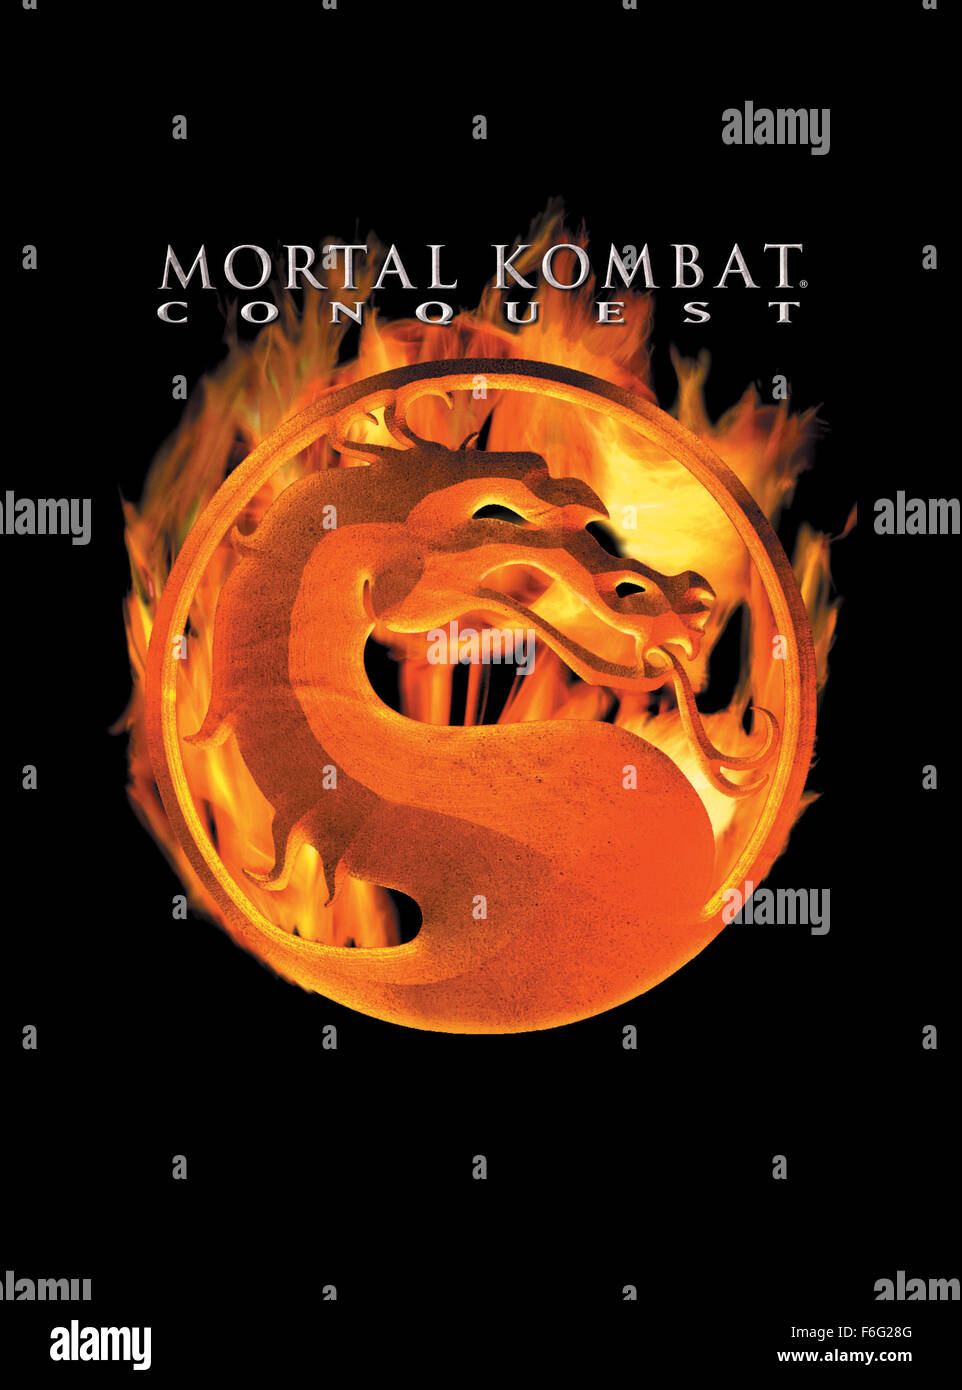 mortal kombat movie stock photos amp mortal kombat movie